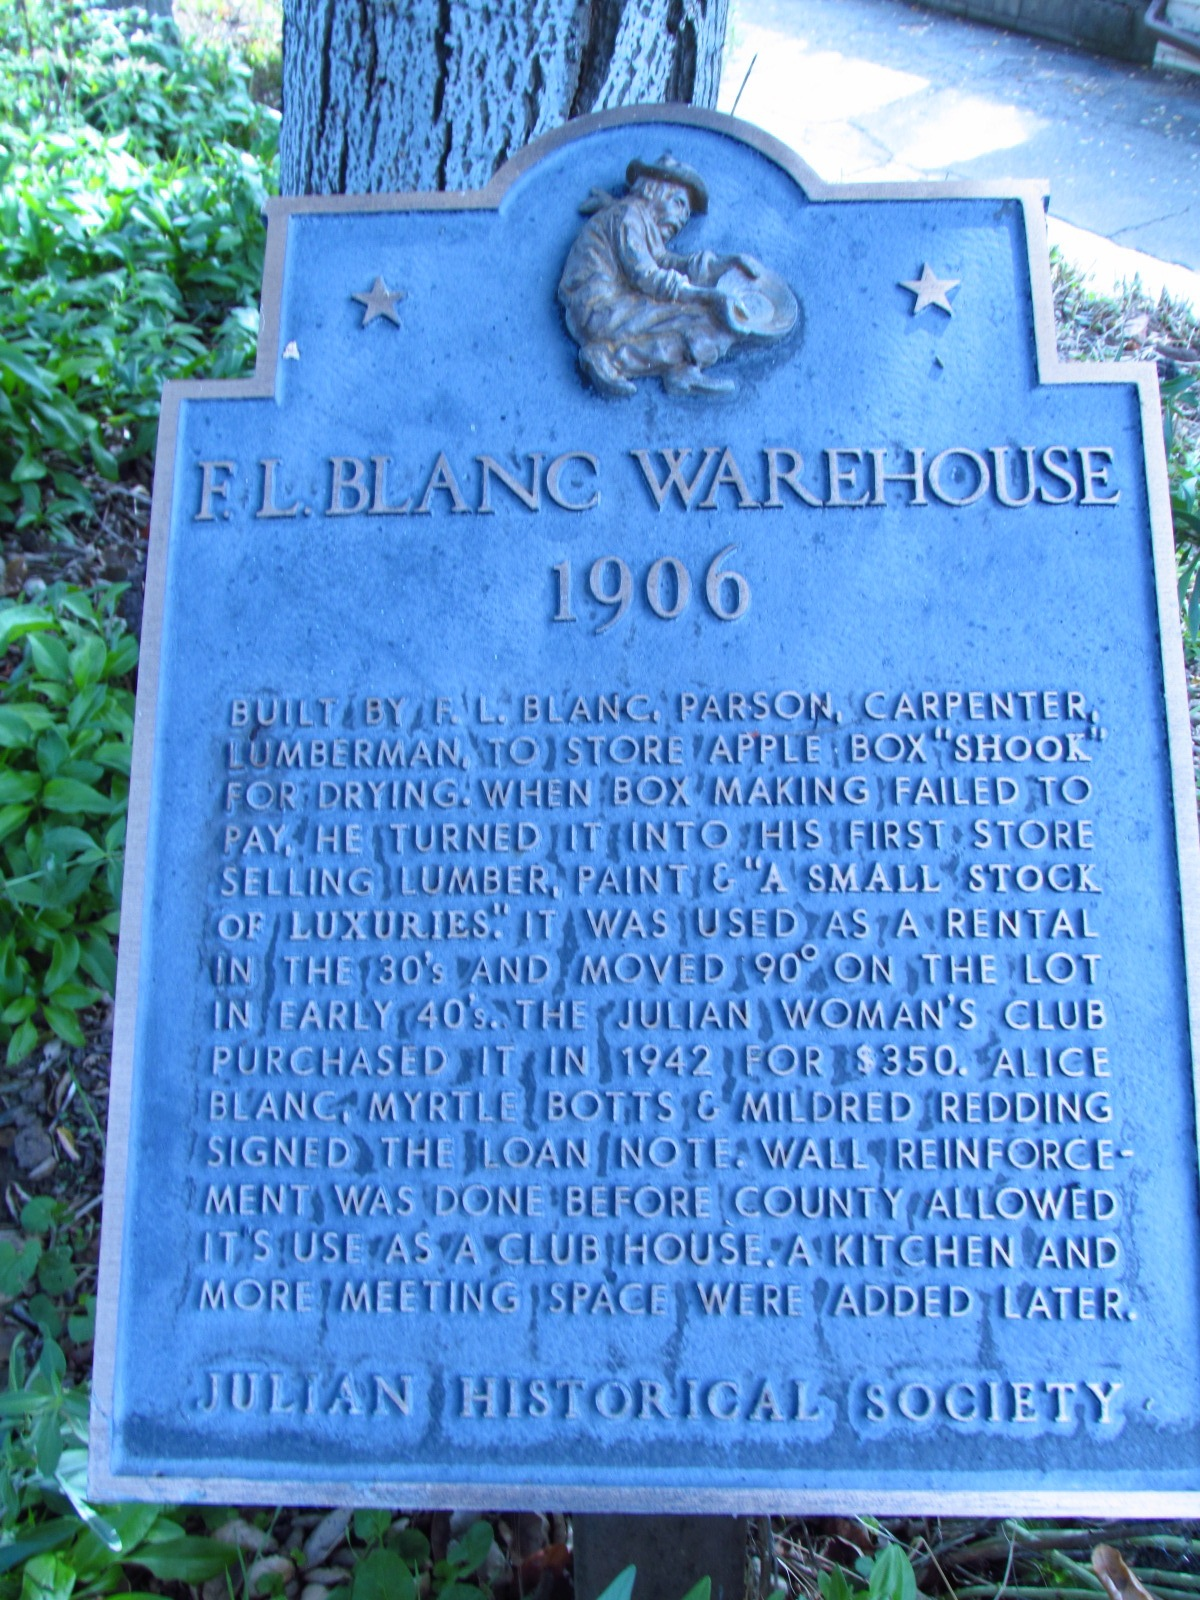 Julian Historical Society F.L. Blanc Warehouse Sign